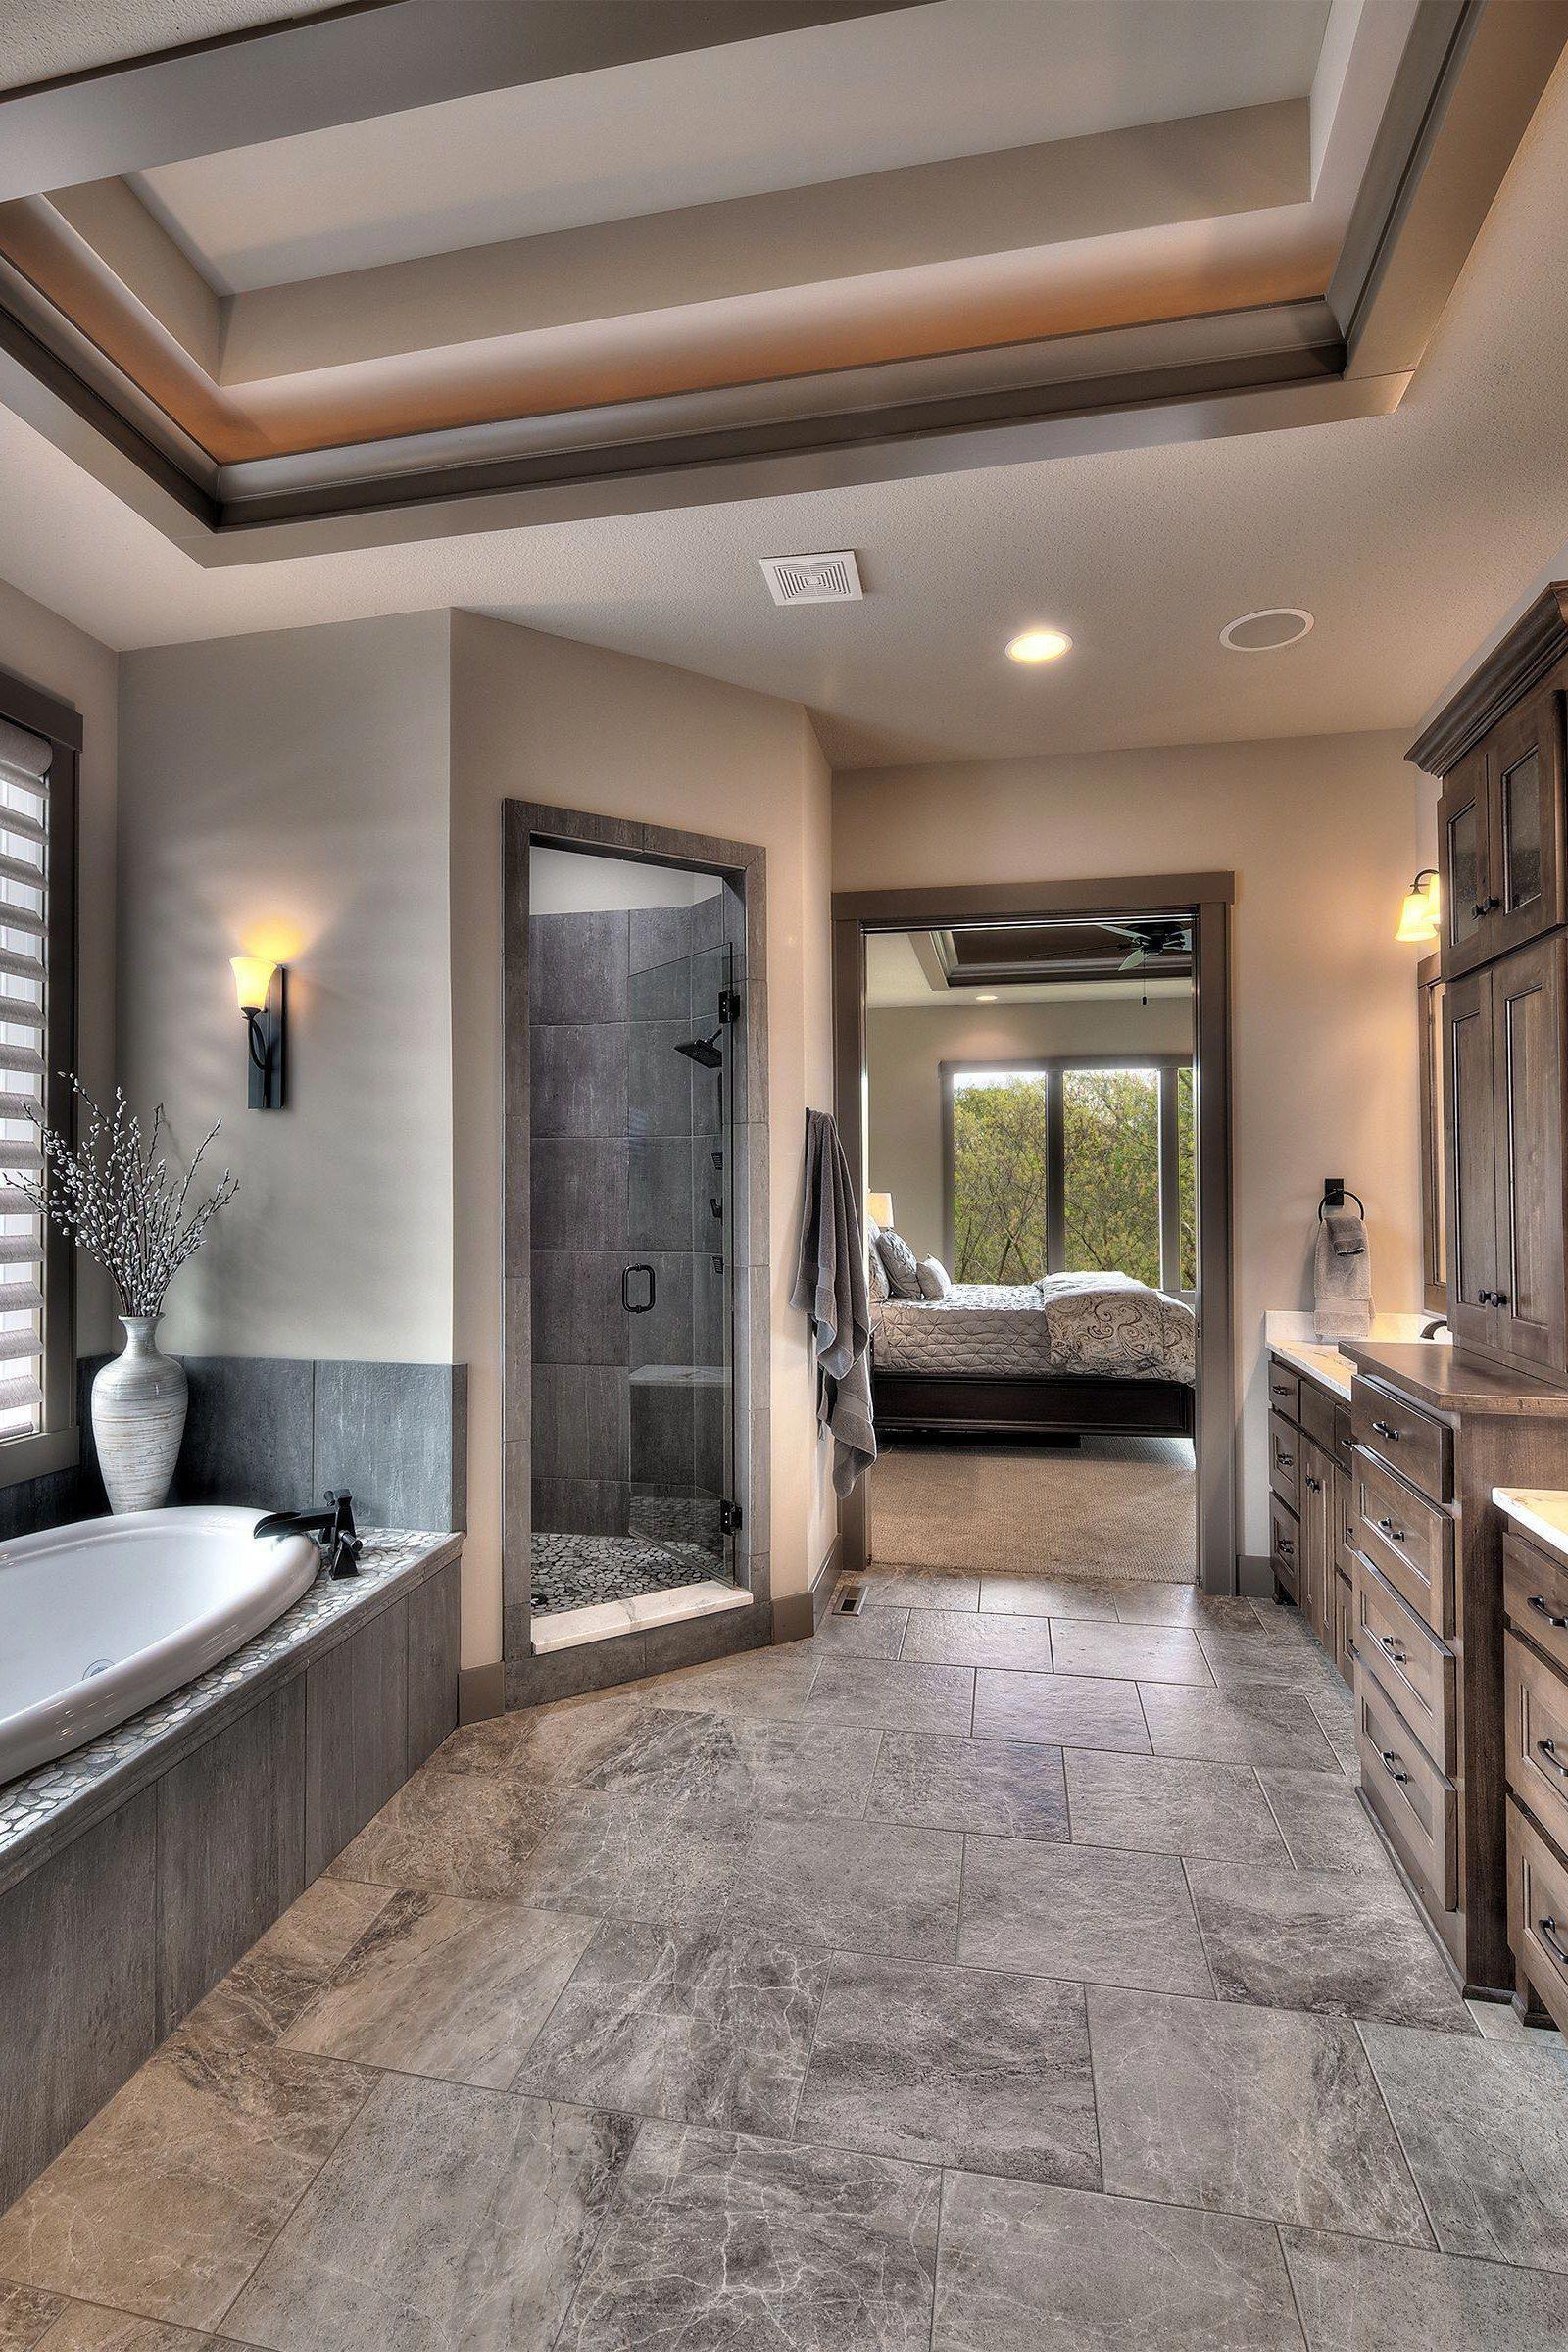 Bathroom Wall Decor Ideas Classy, Classy Bathroom Decor